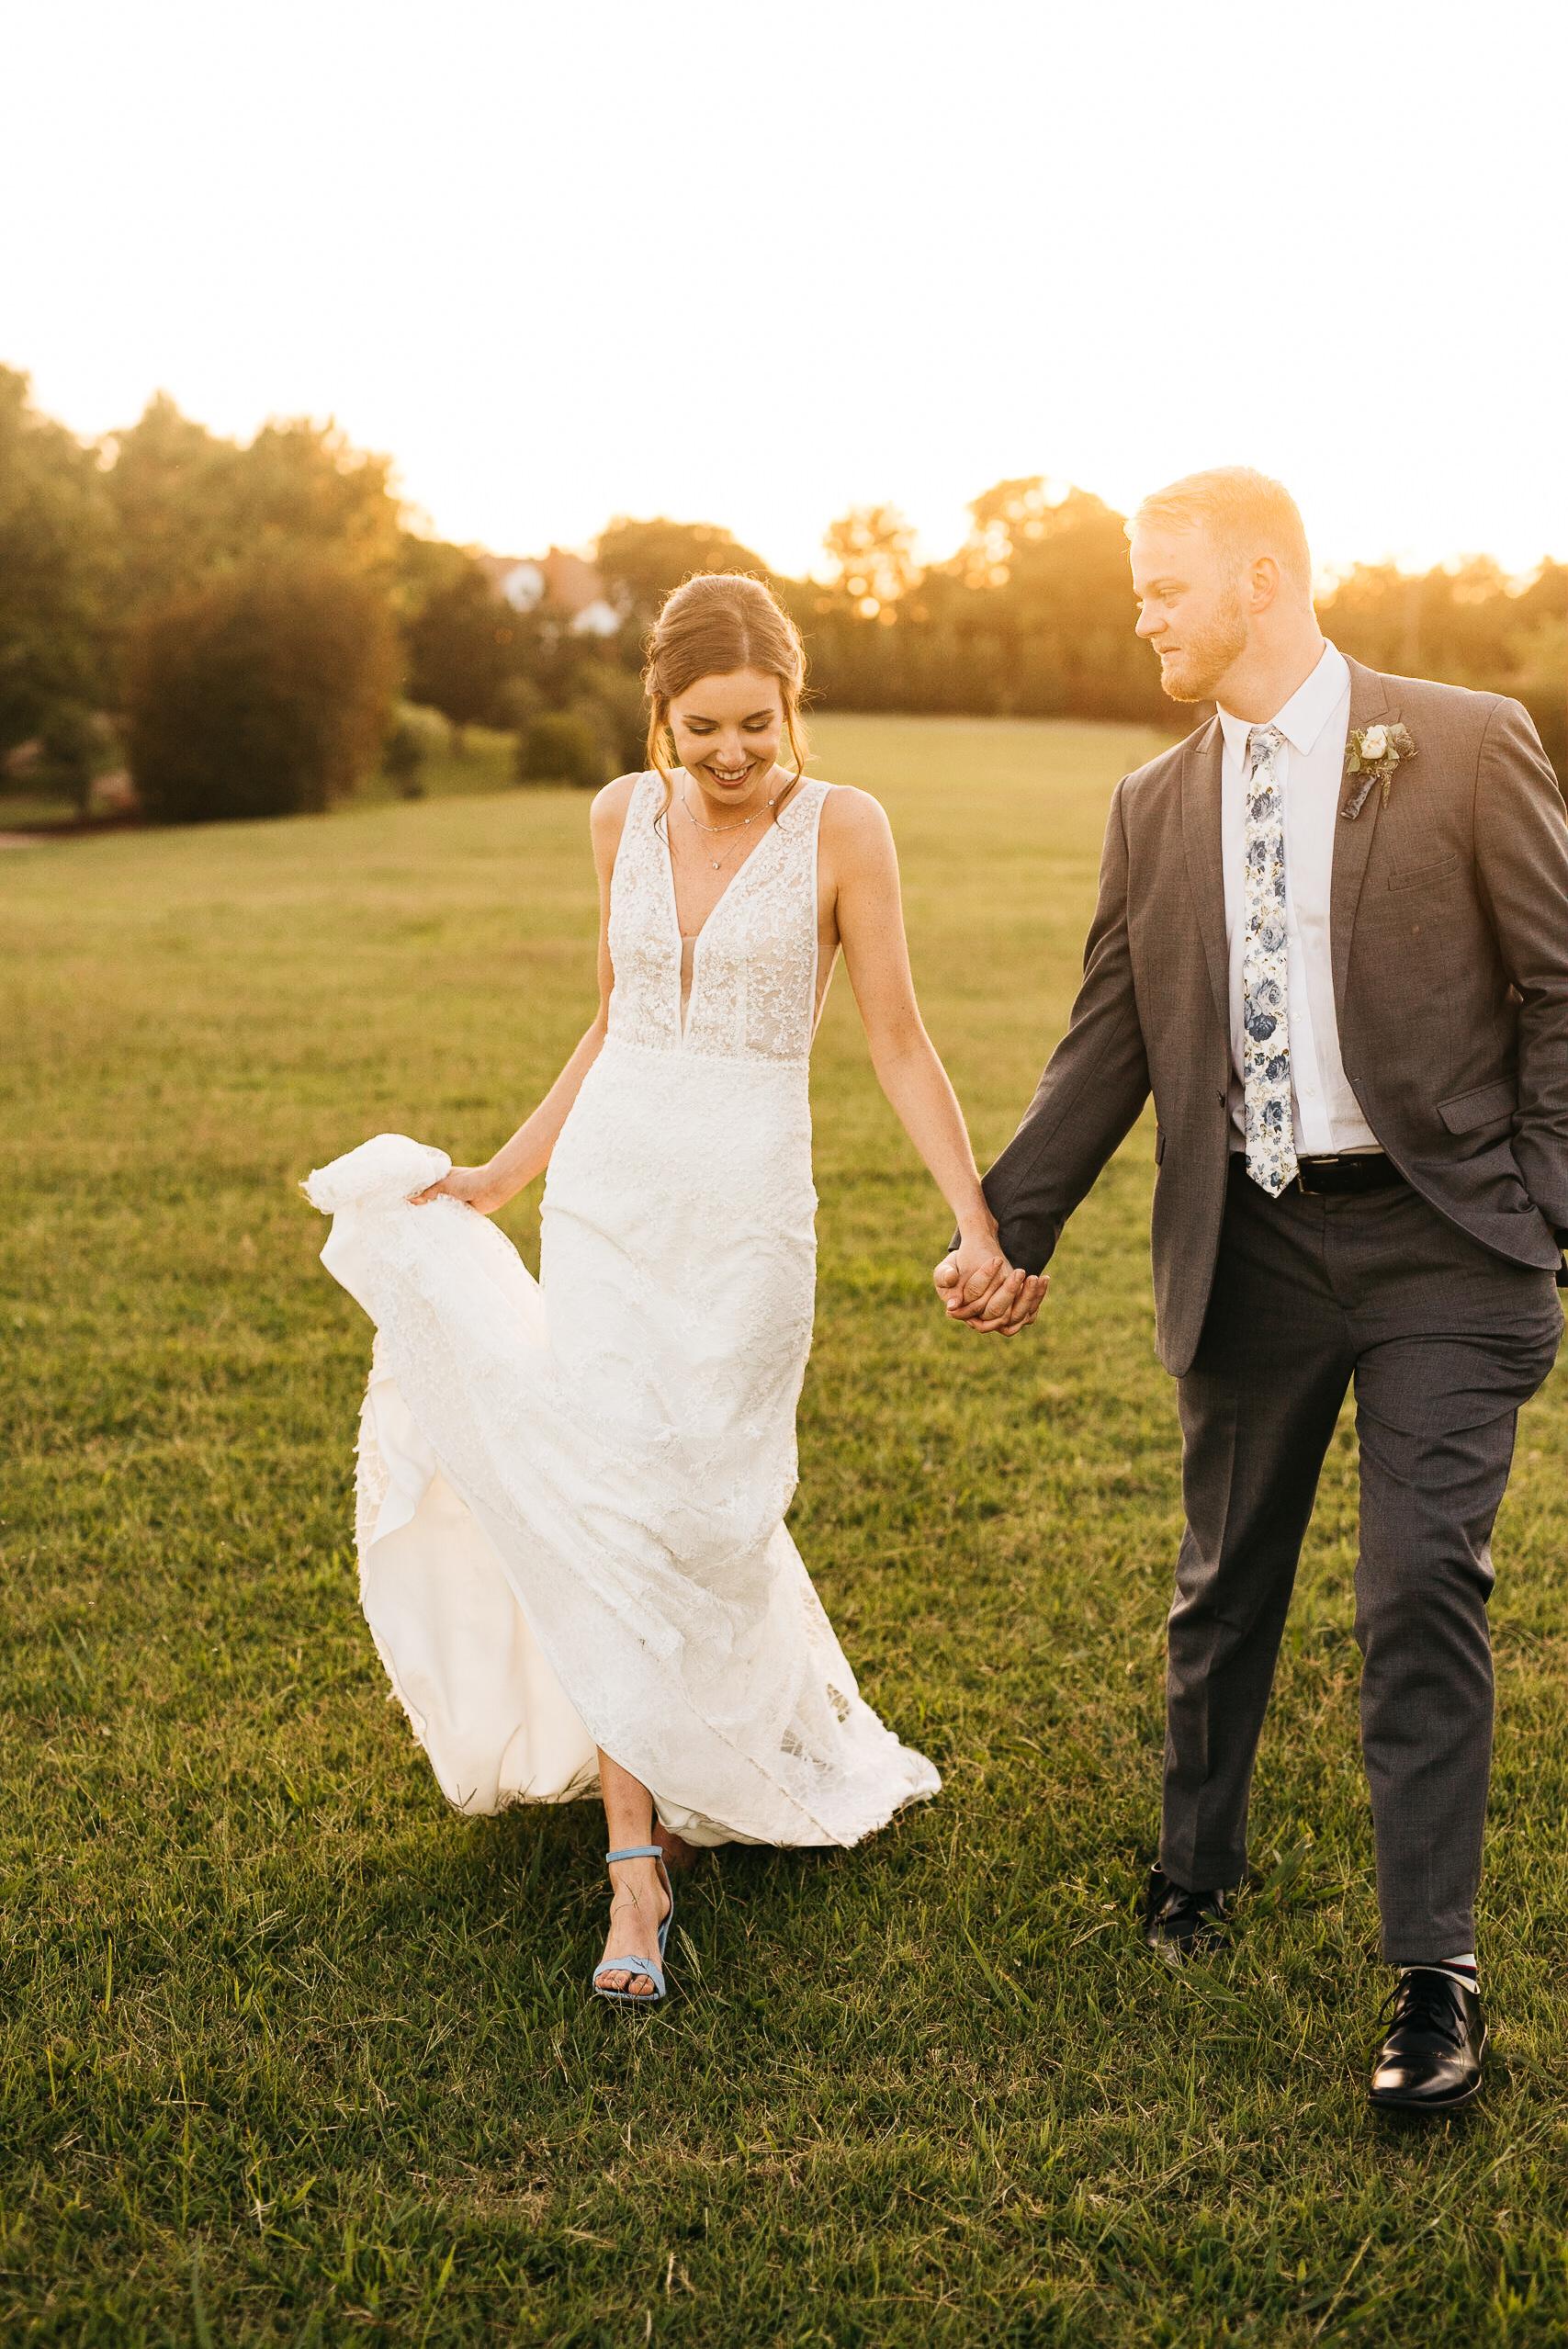 okc-wedding-photographer-coles-garden-wedding-okc-best-wedding-photographers-146.jpg